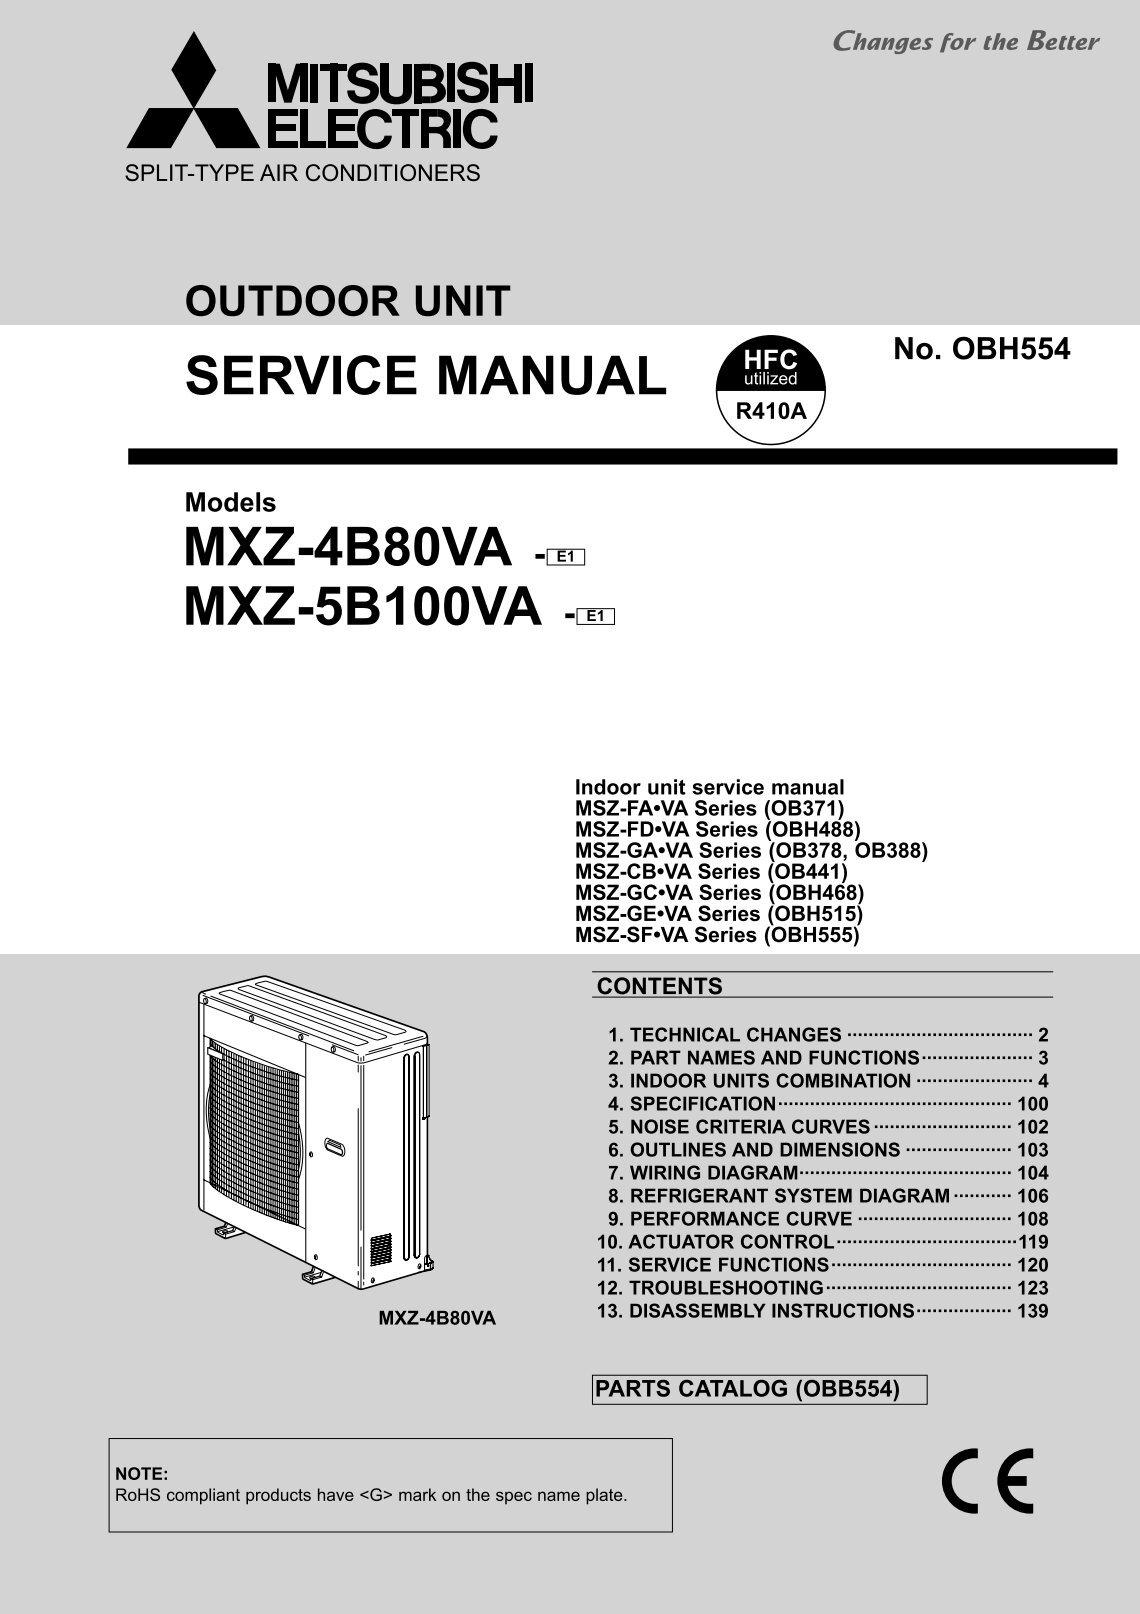 Kt76a Wiring Diagram Wiring Data Source king kt76a wiring diagram wiring data alternator .